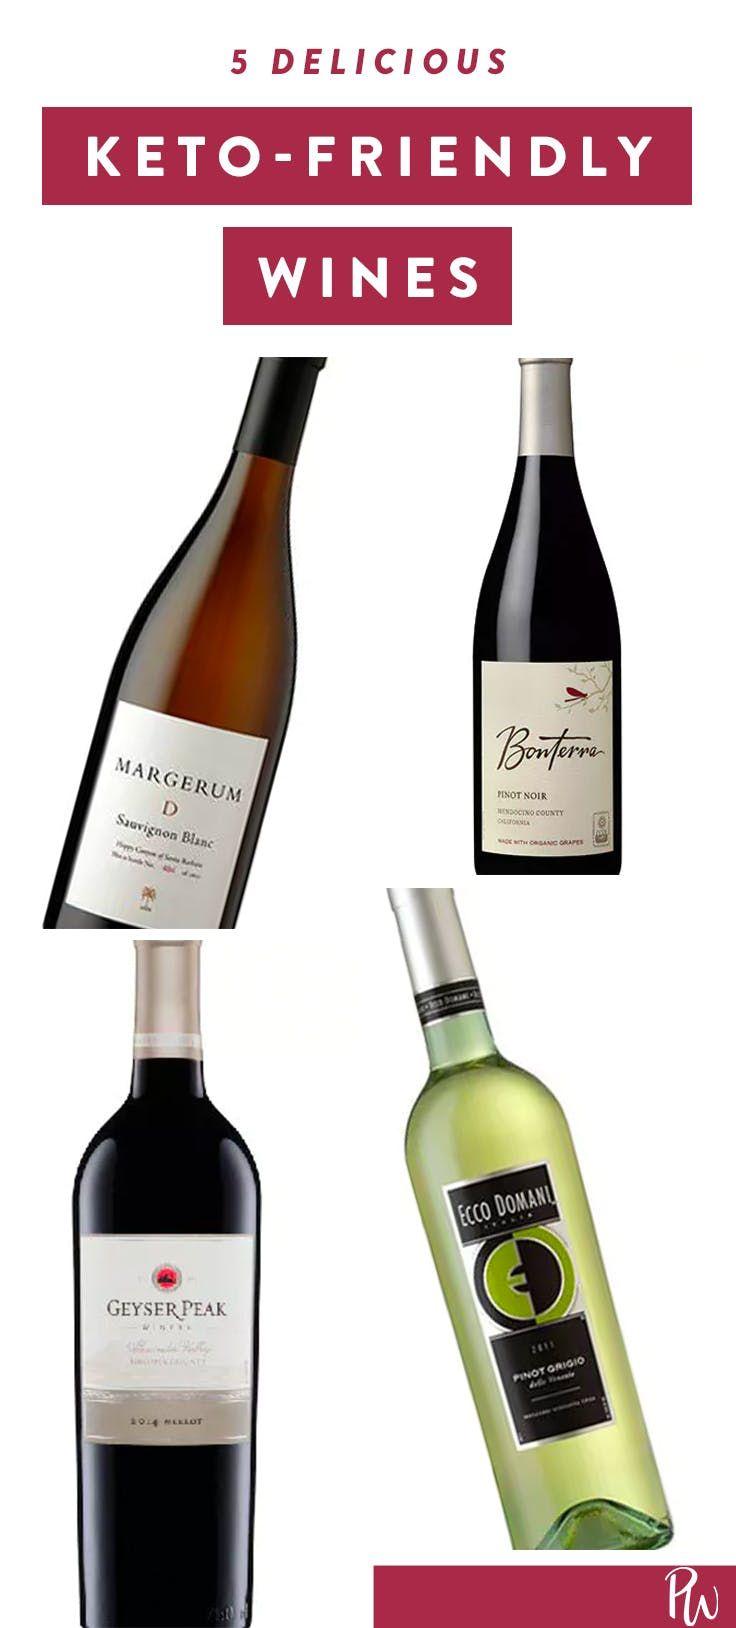 is wine allowed on keto diet?